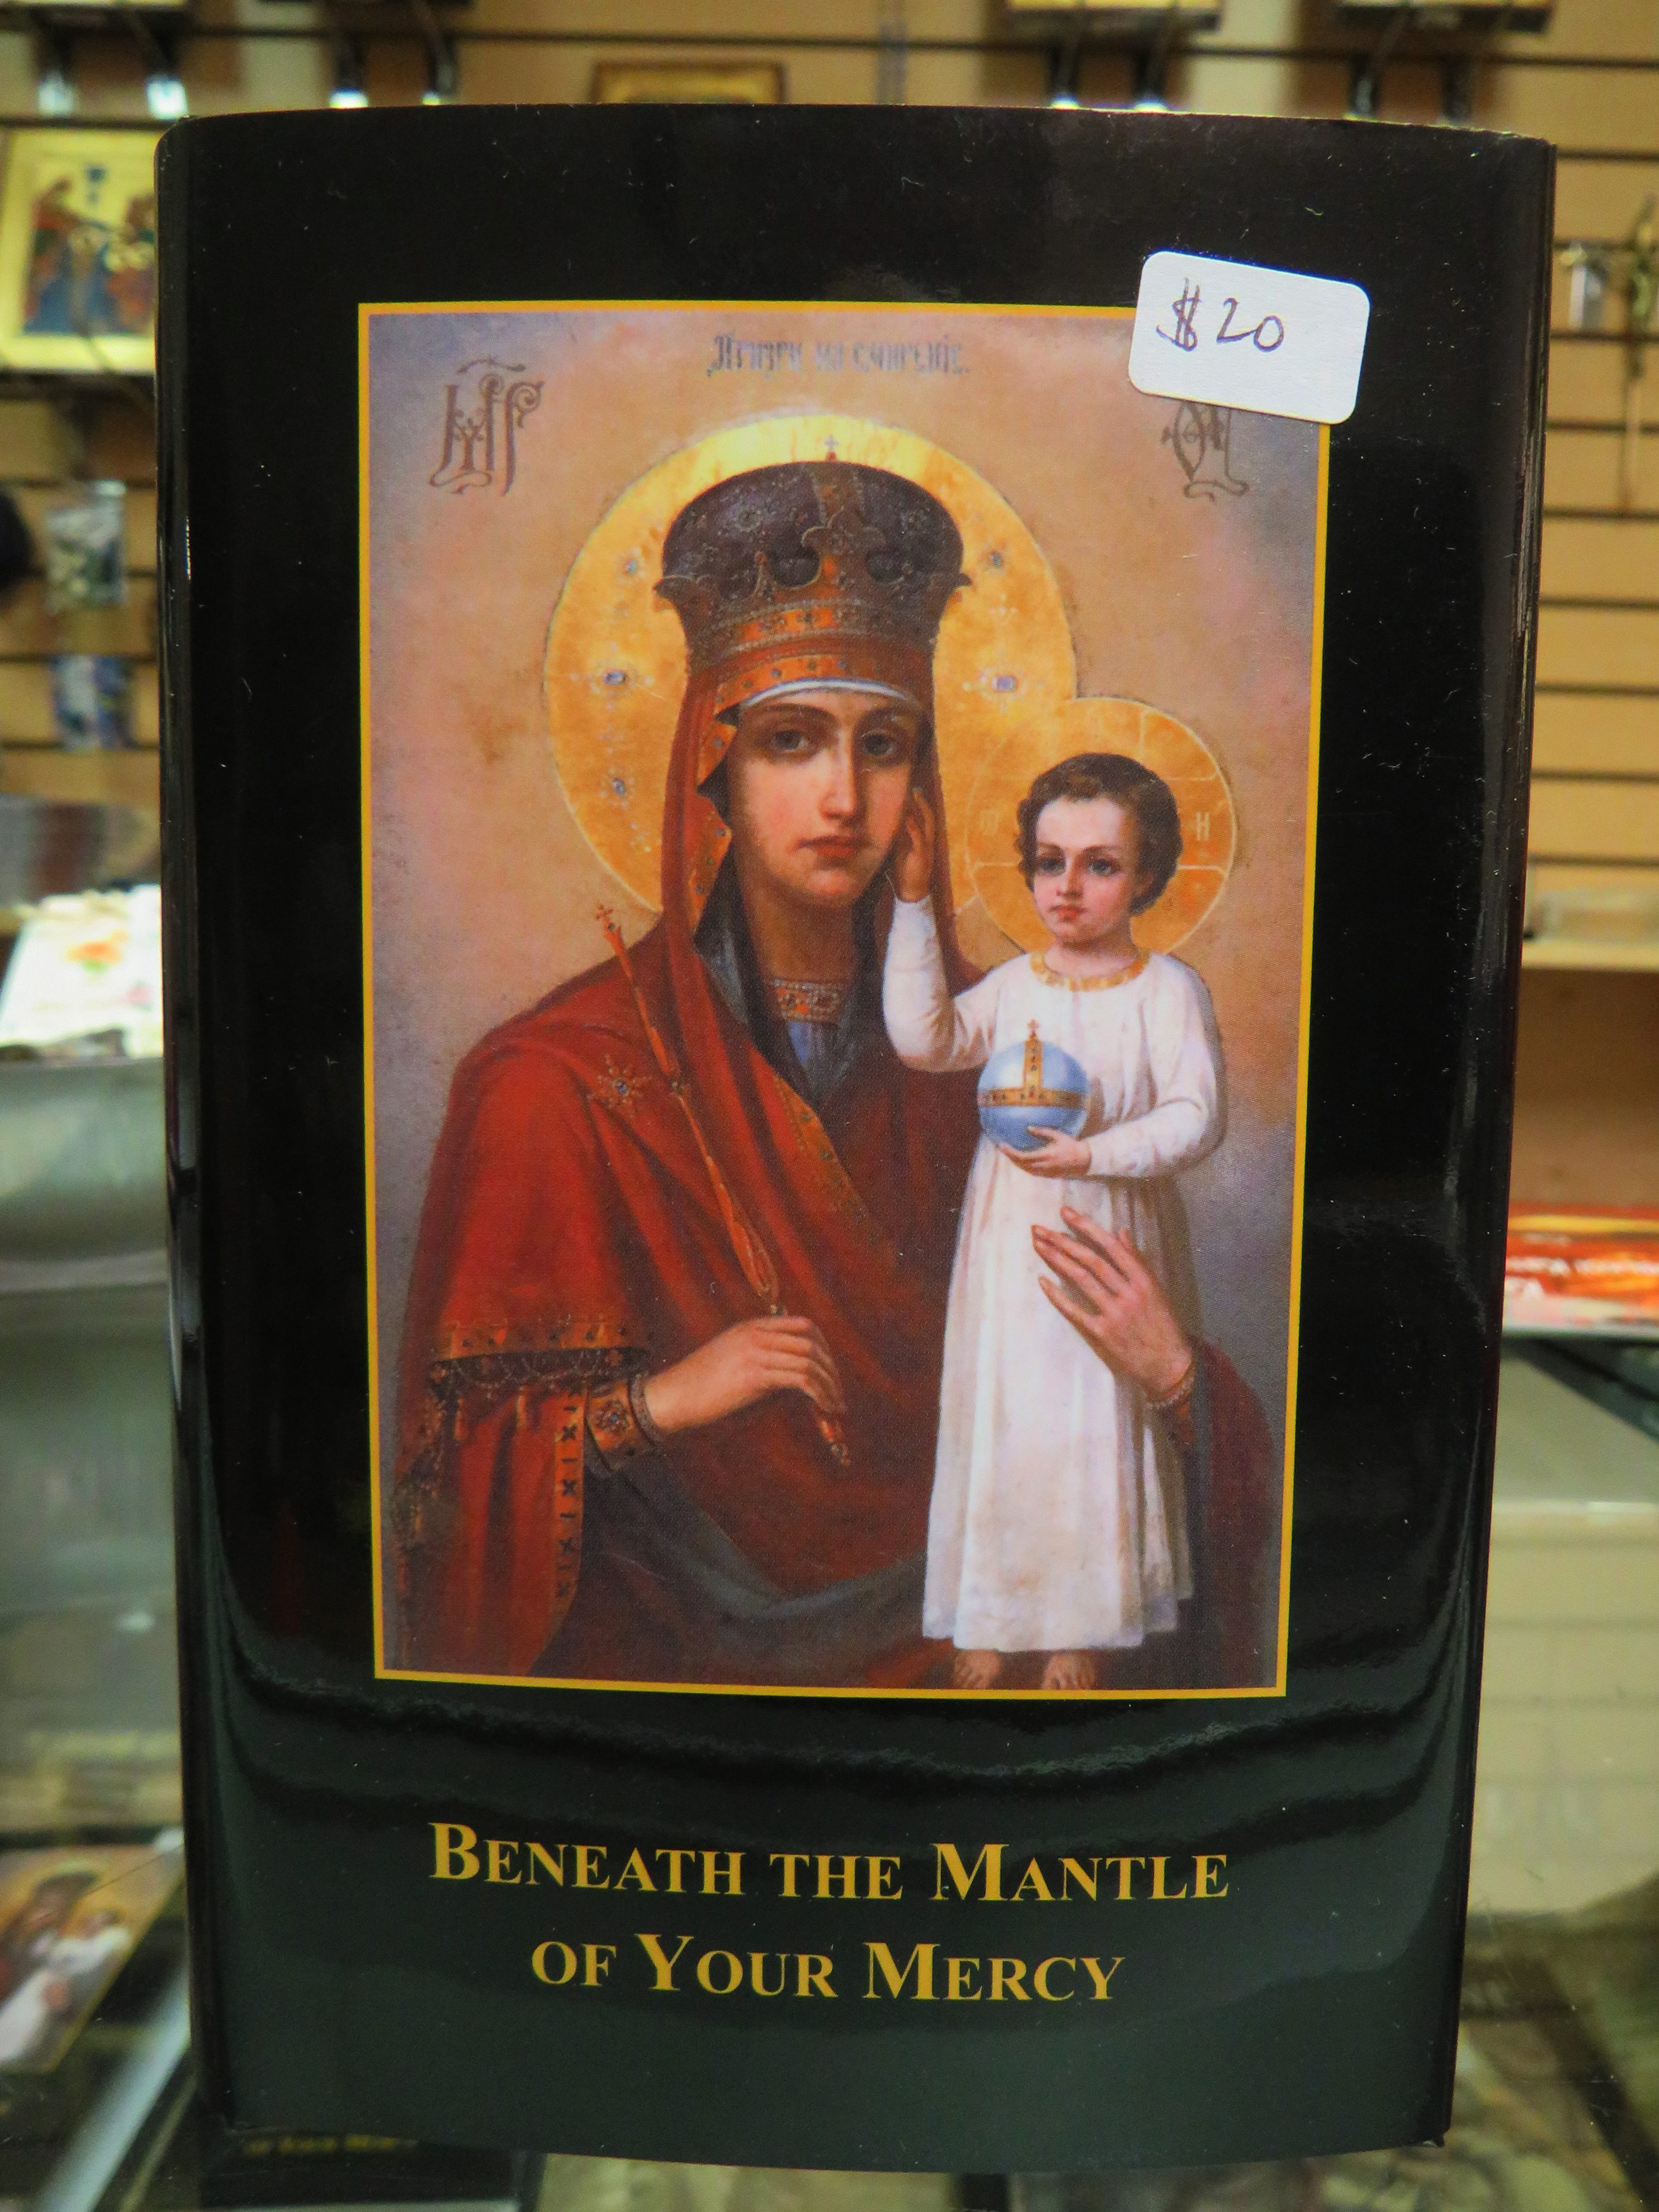 Fr. Peter Babej's Book